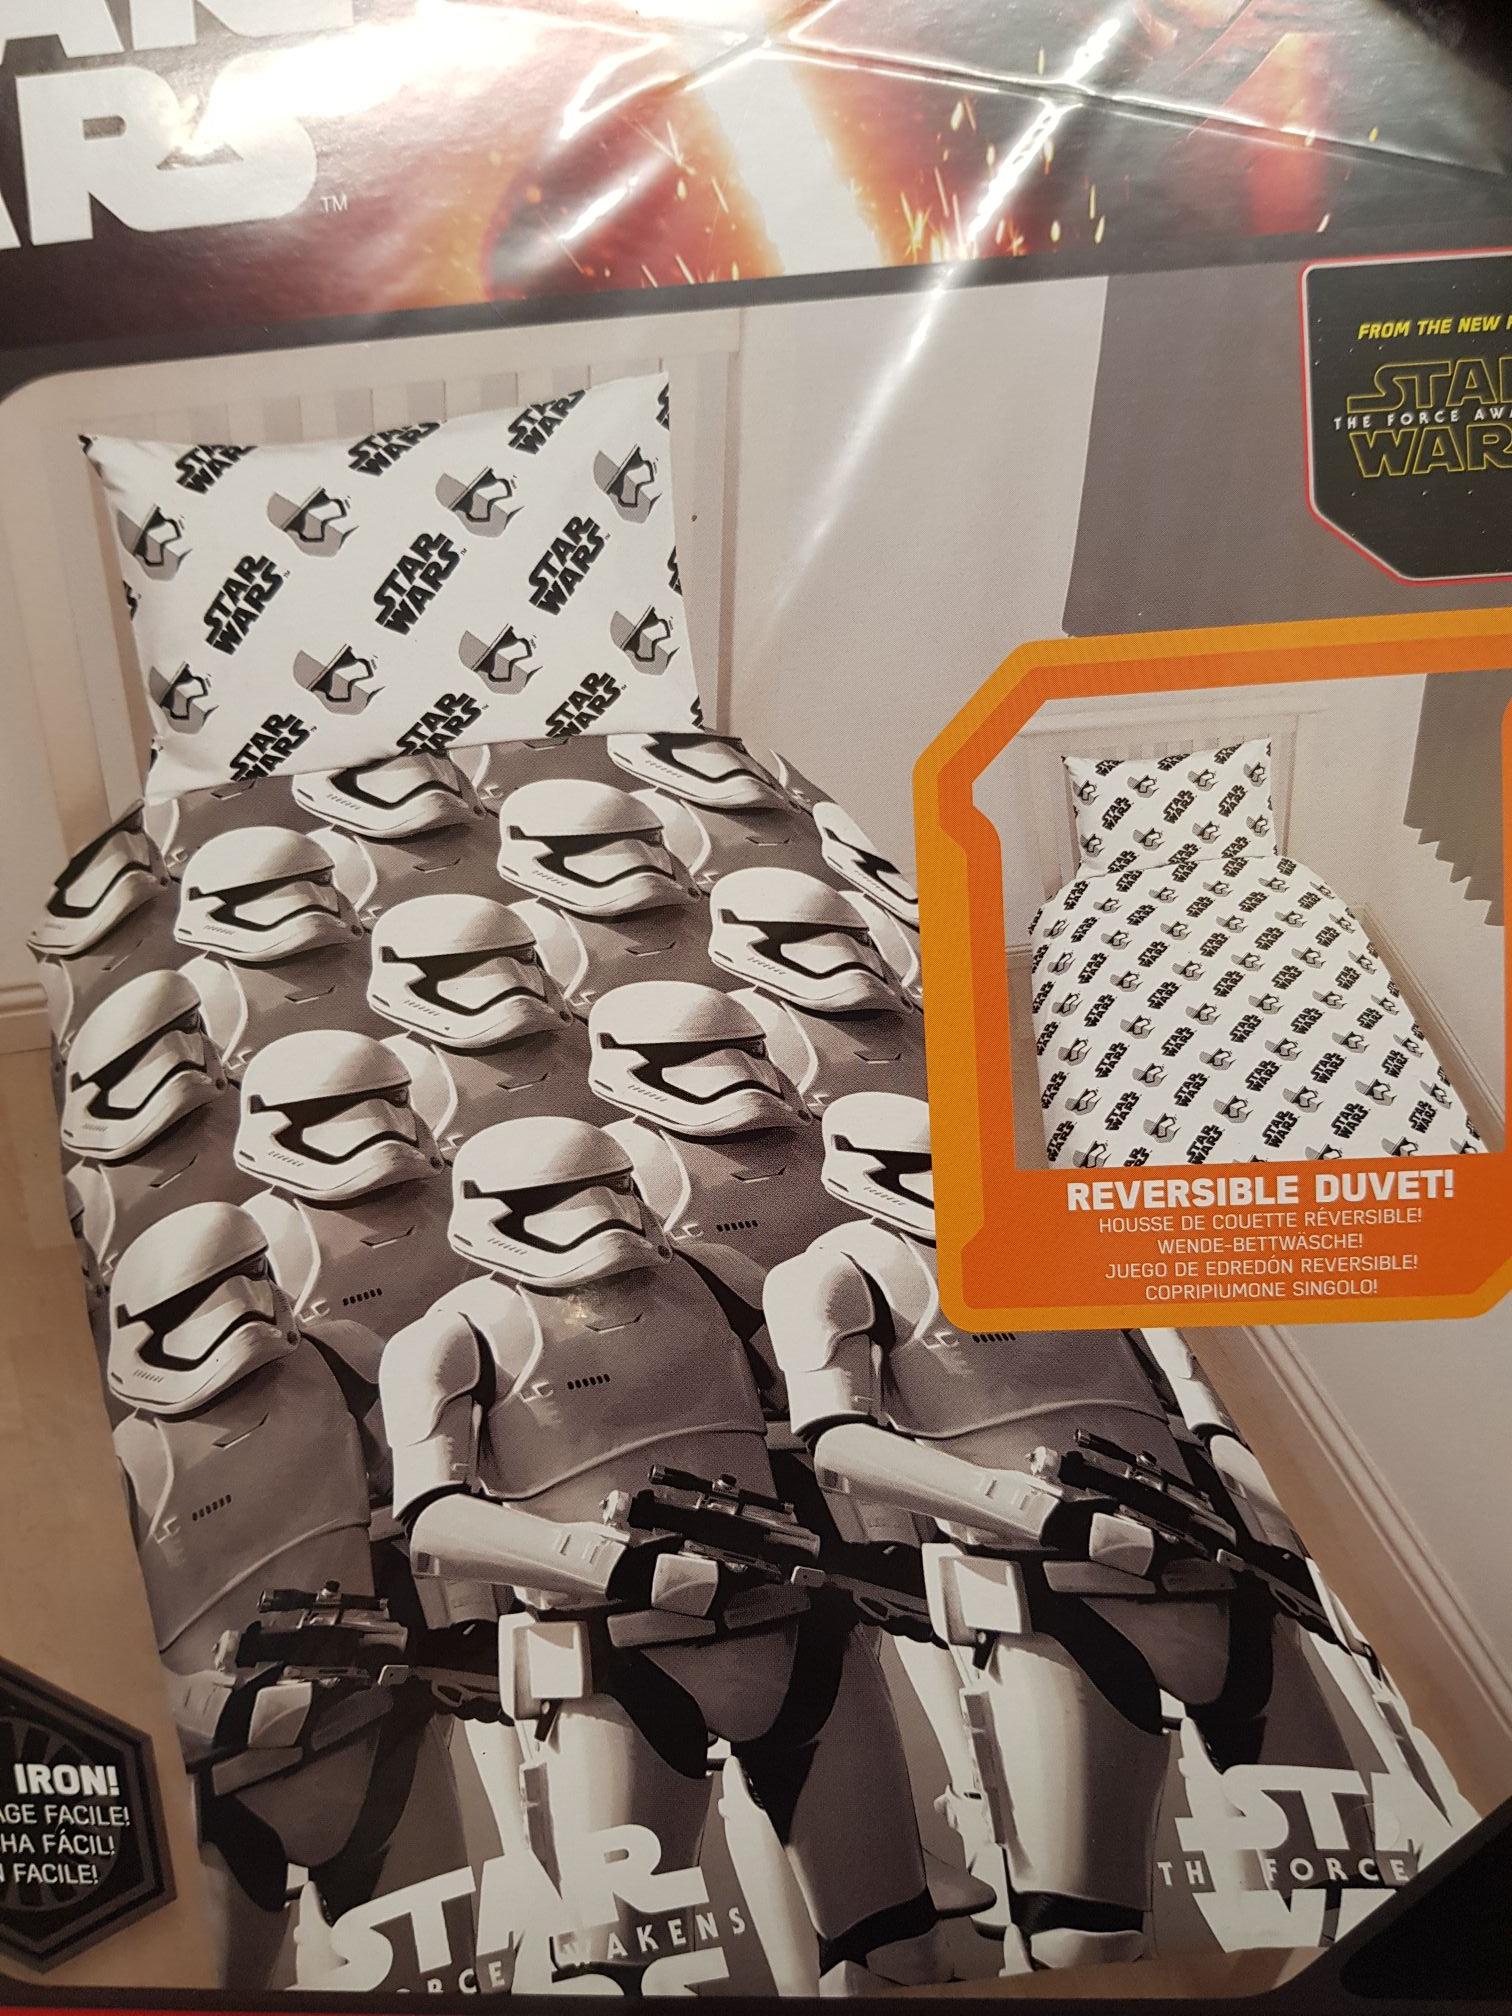 Official Star Wars reversible single duvet cover set - £3.99 instore @ Home Bargains